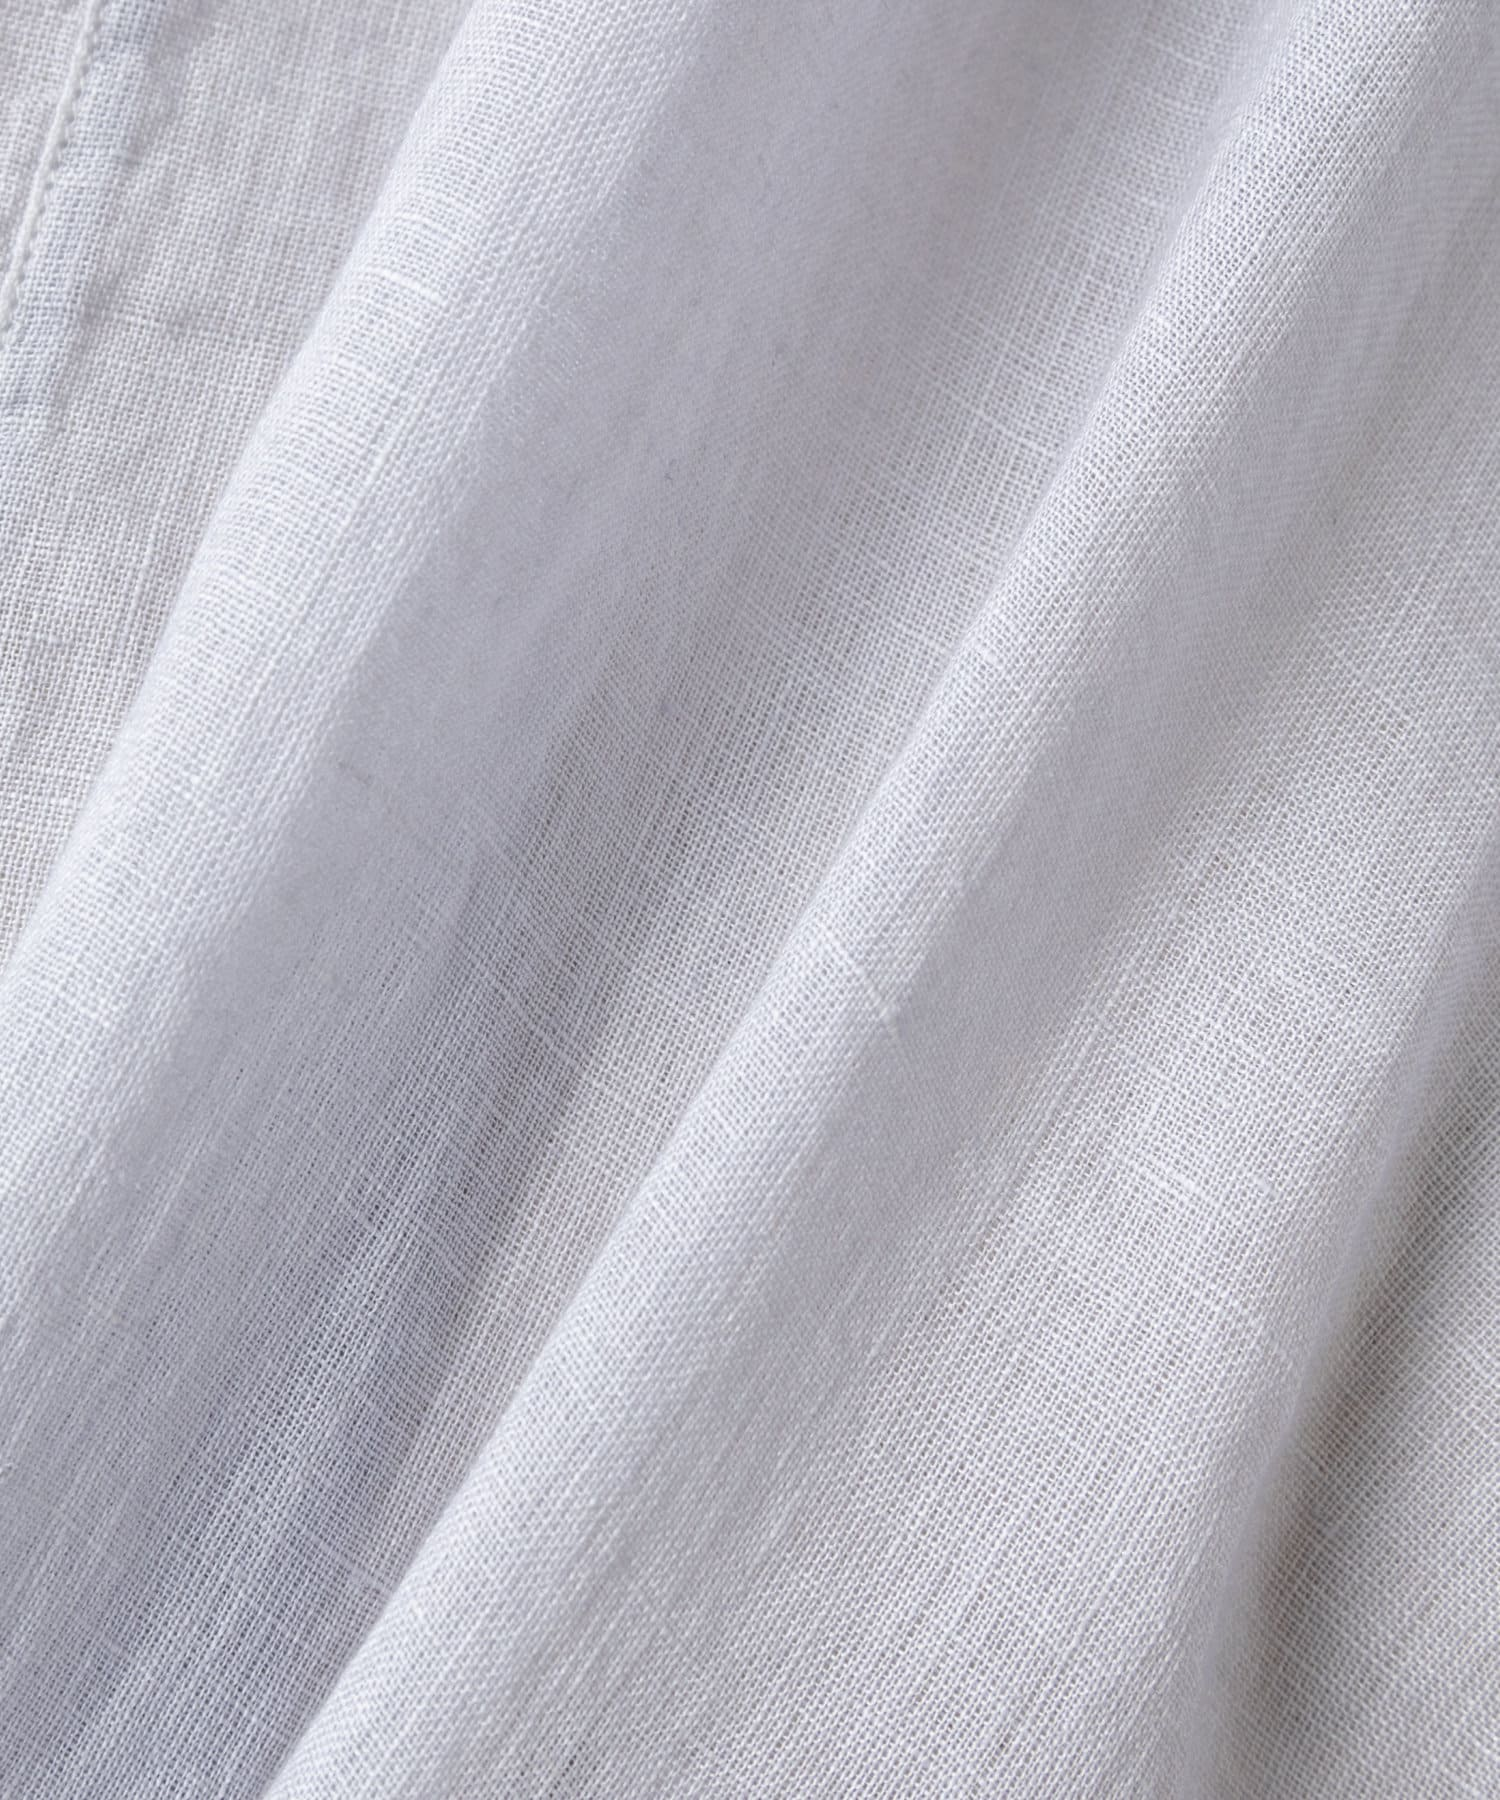 LIVETART(リヴェタート) 【動画付き】《120%lino》リネンロングブラウス